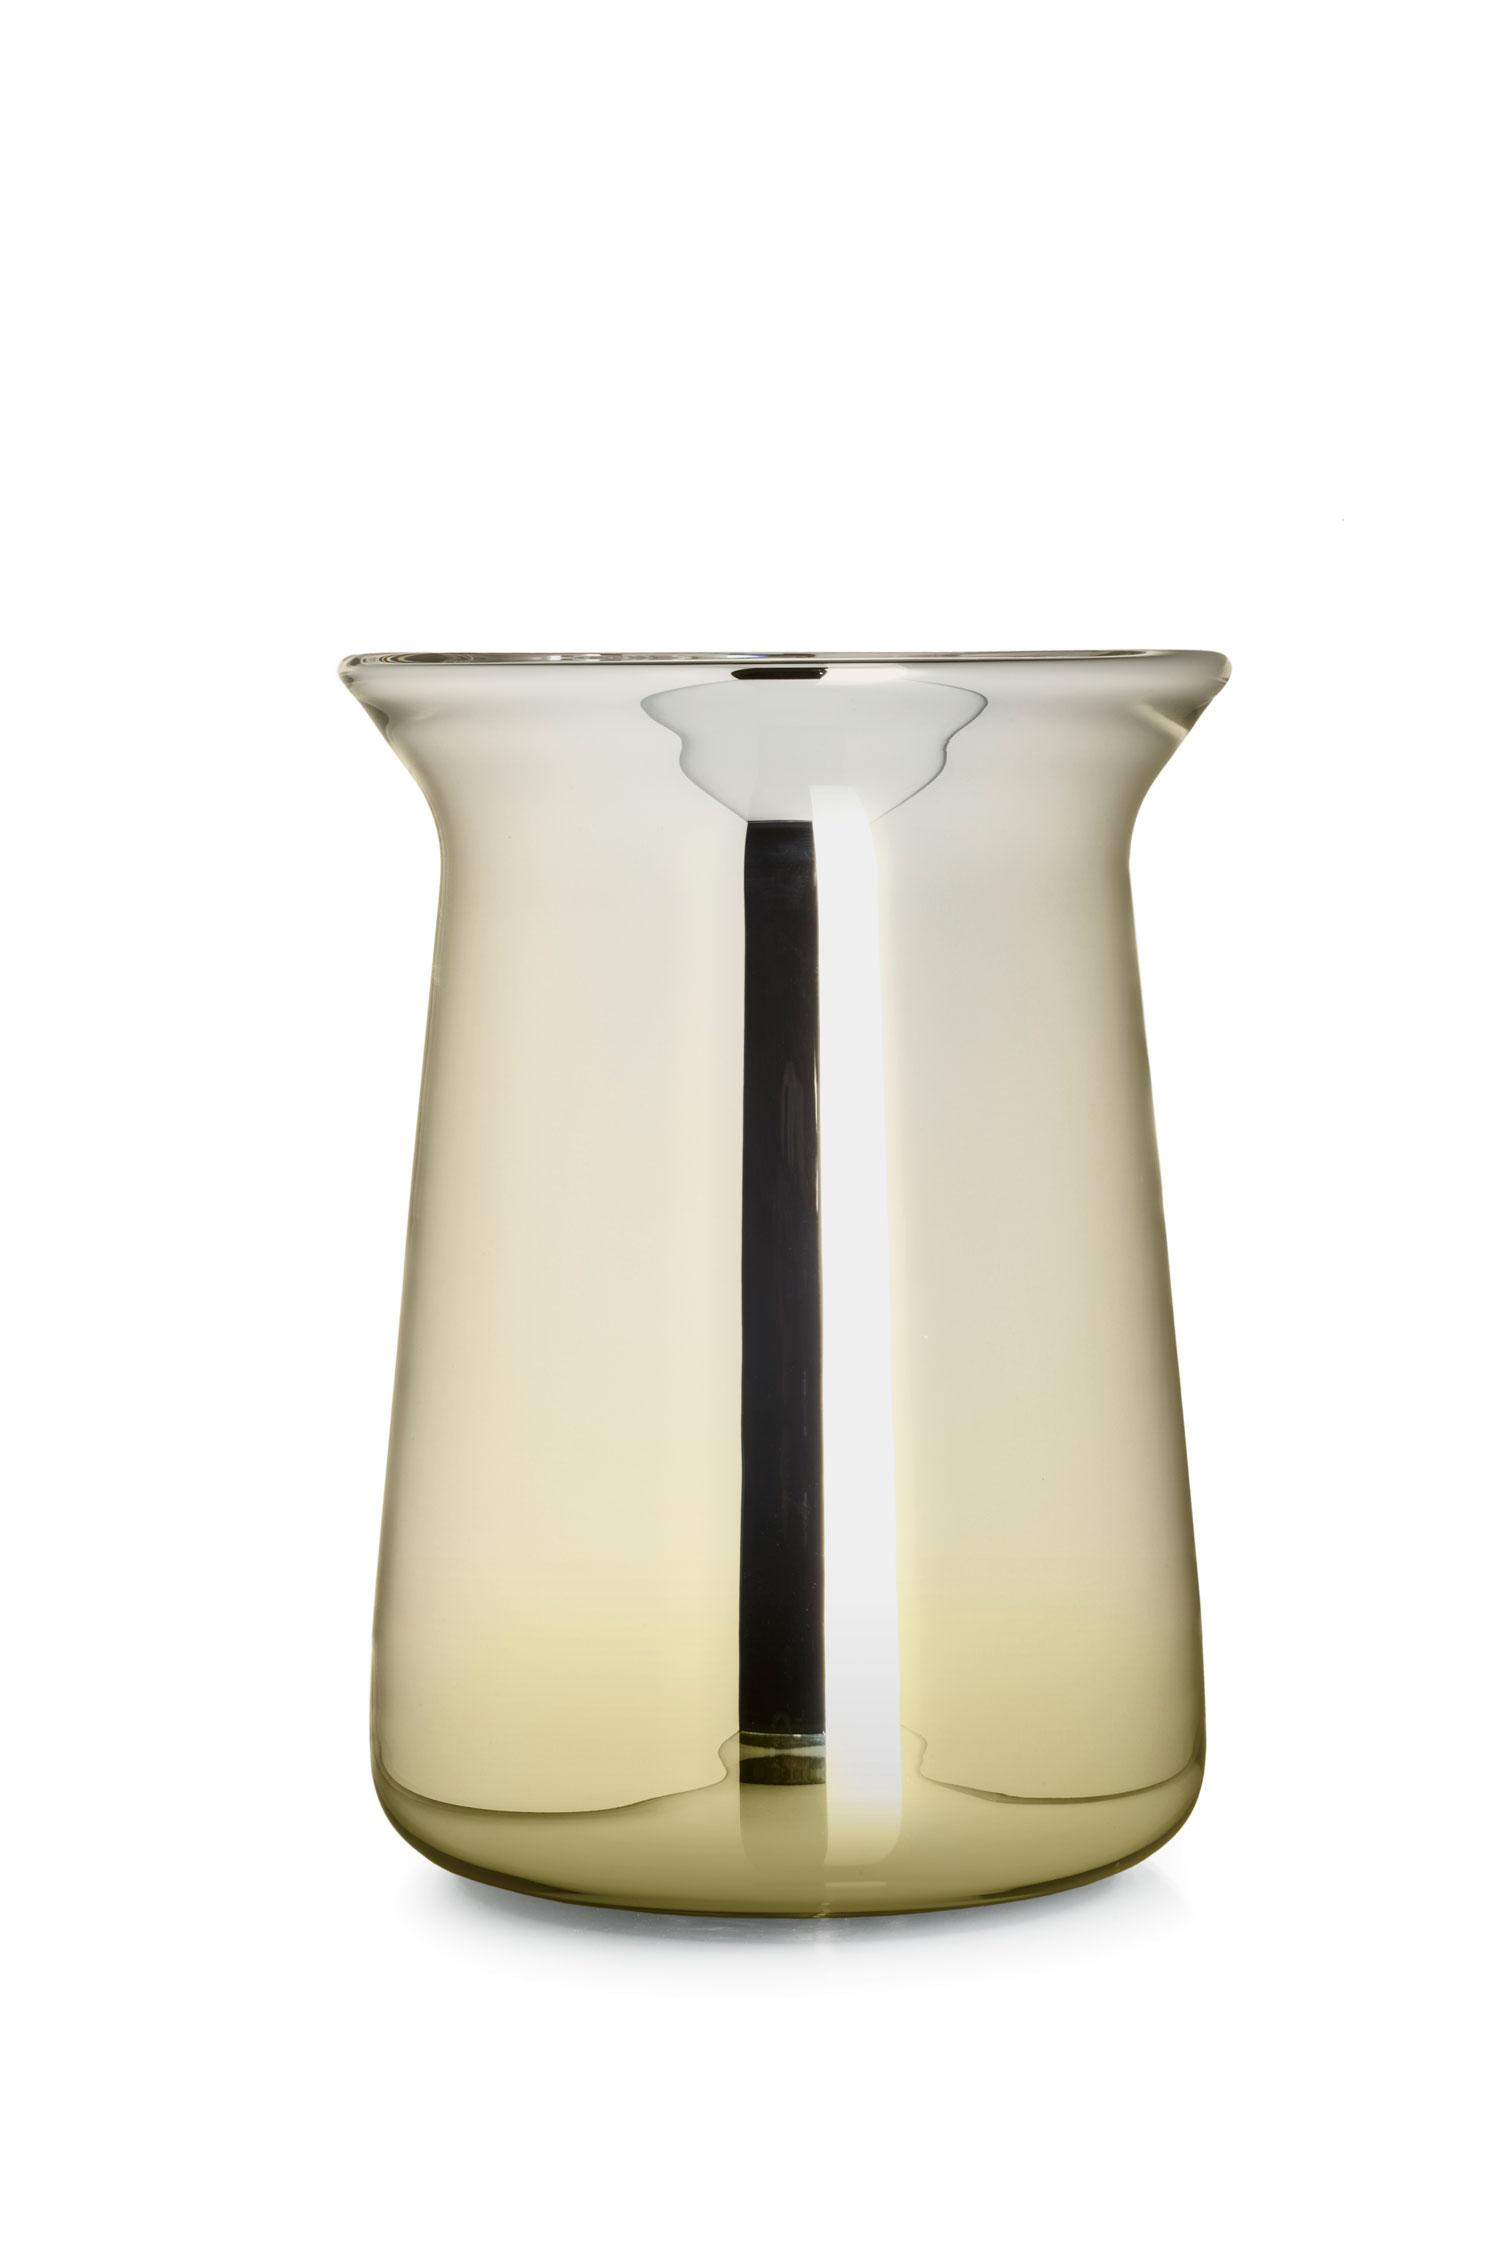 New Products from Studio Sebastian Herkner   Yellowtrace